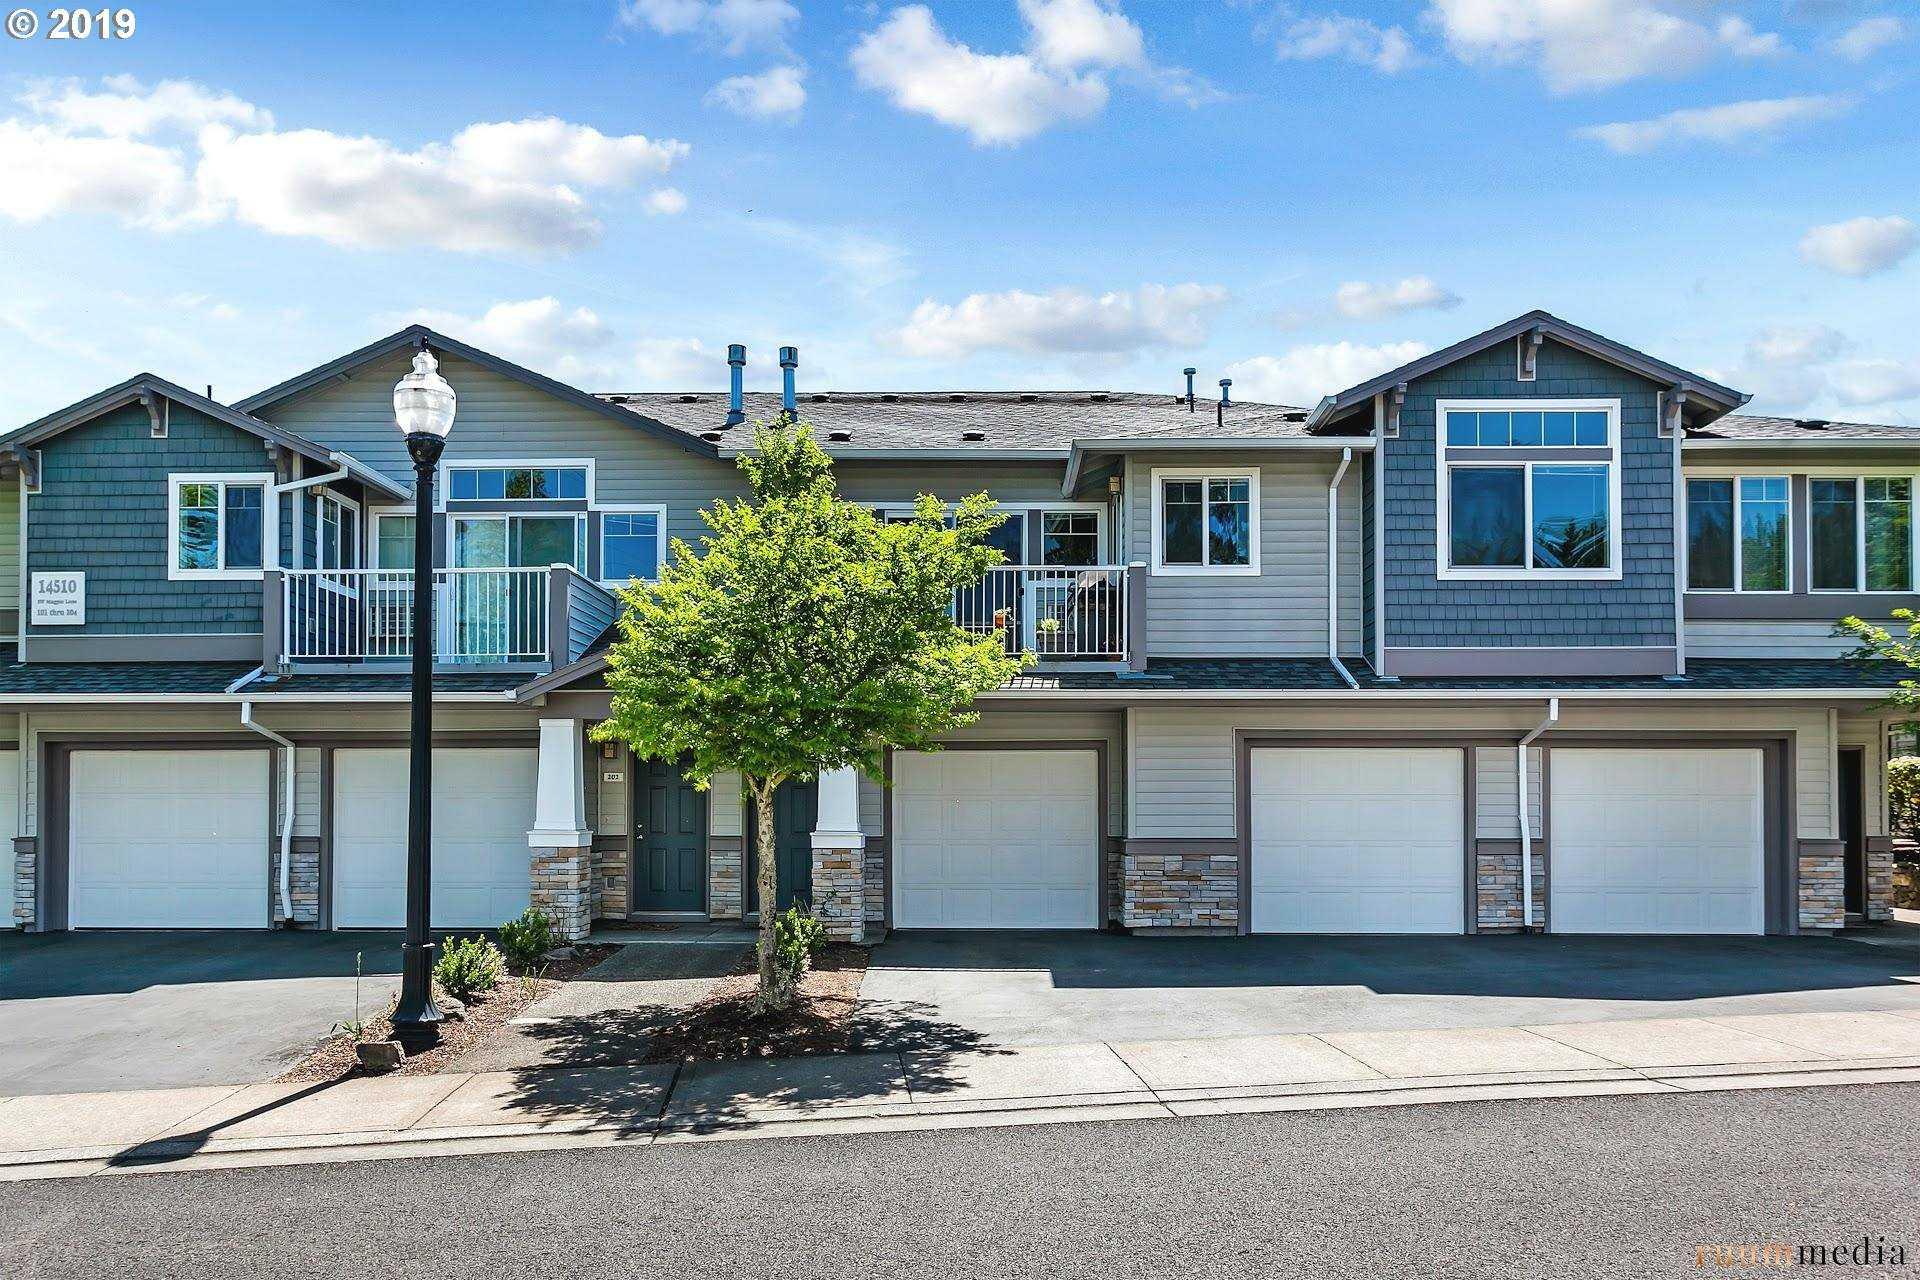 $240,000 - 2Br/1Ba -  for Sale in Progress Ridge, Beaverton